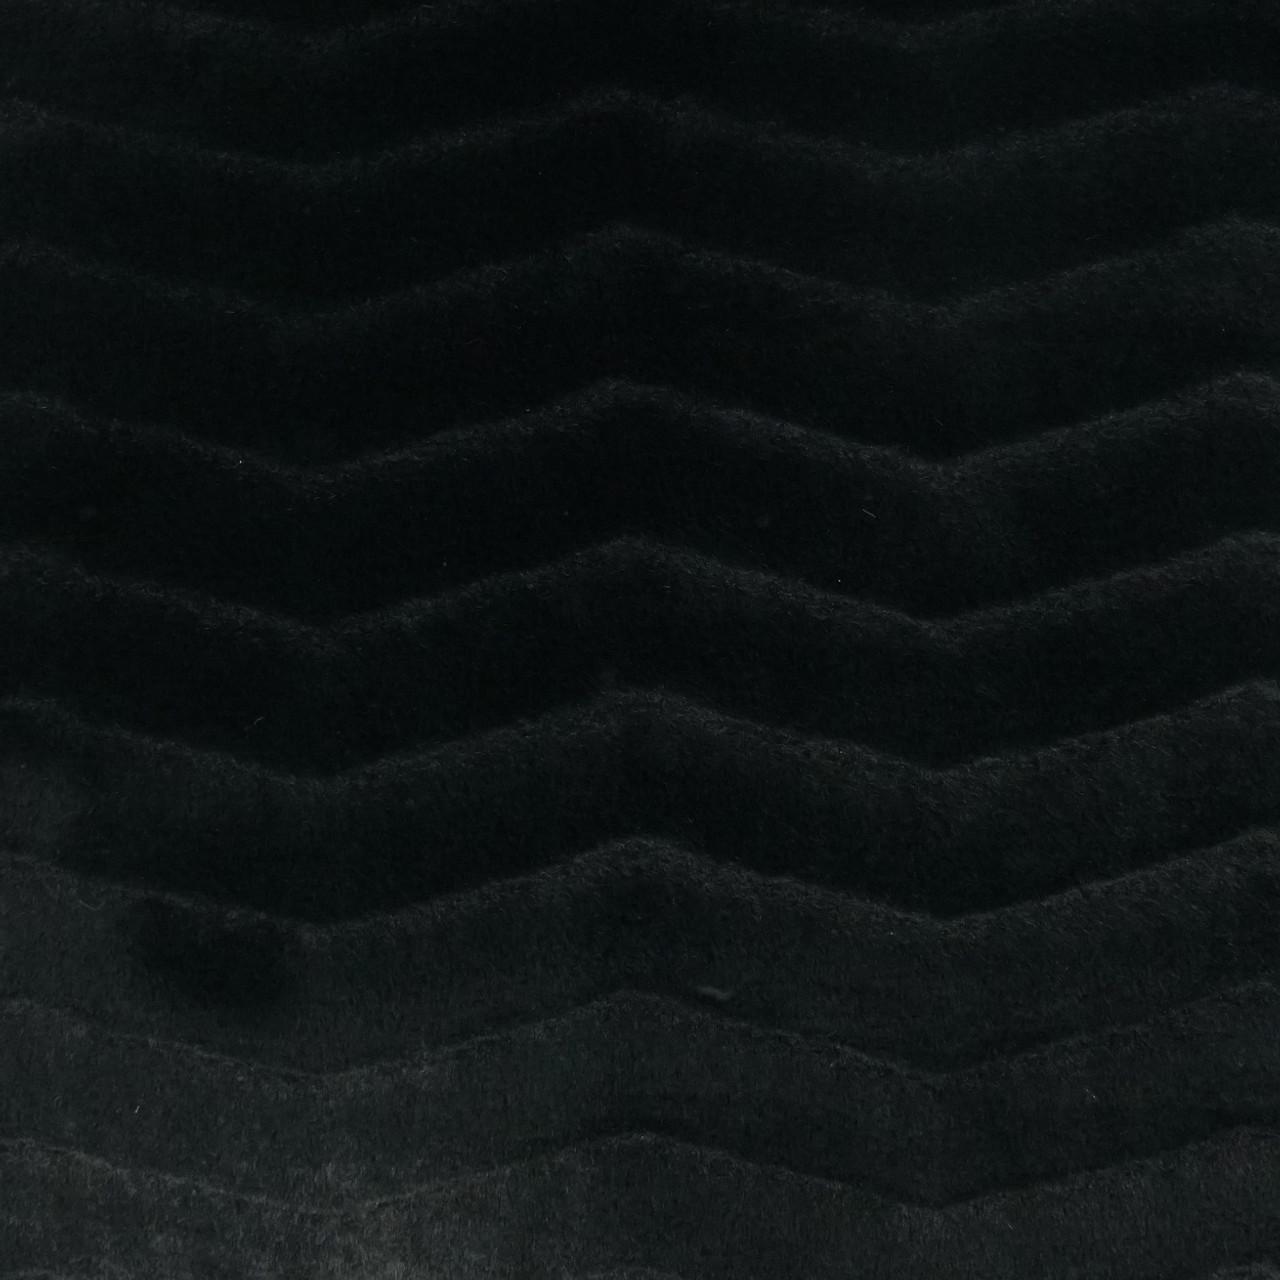 Lush Faux Fur Chevron Throw Pillow - Black